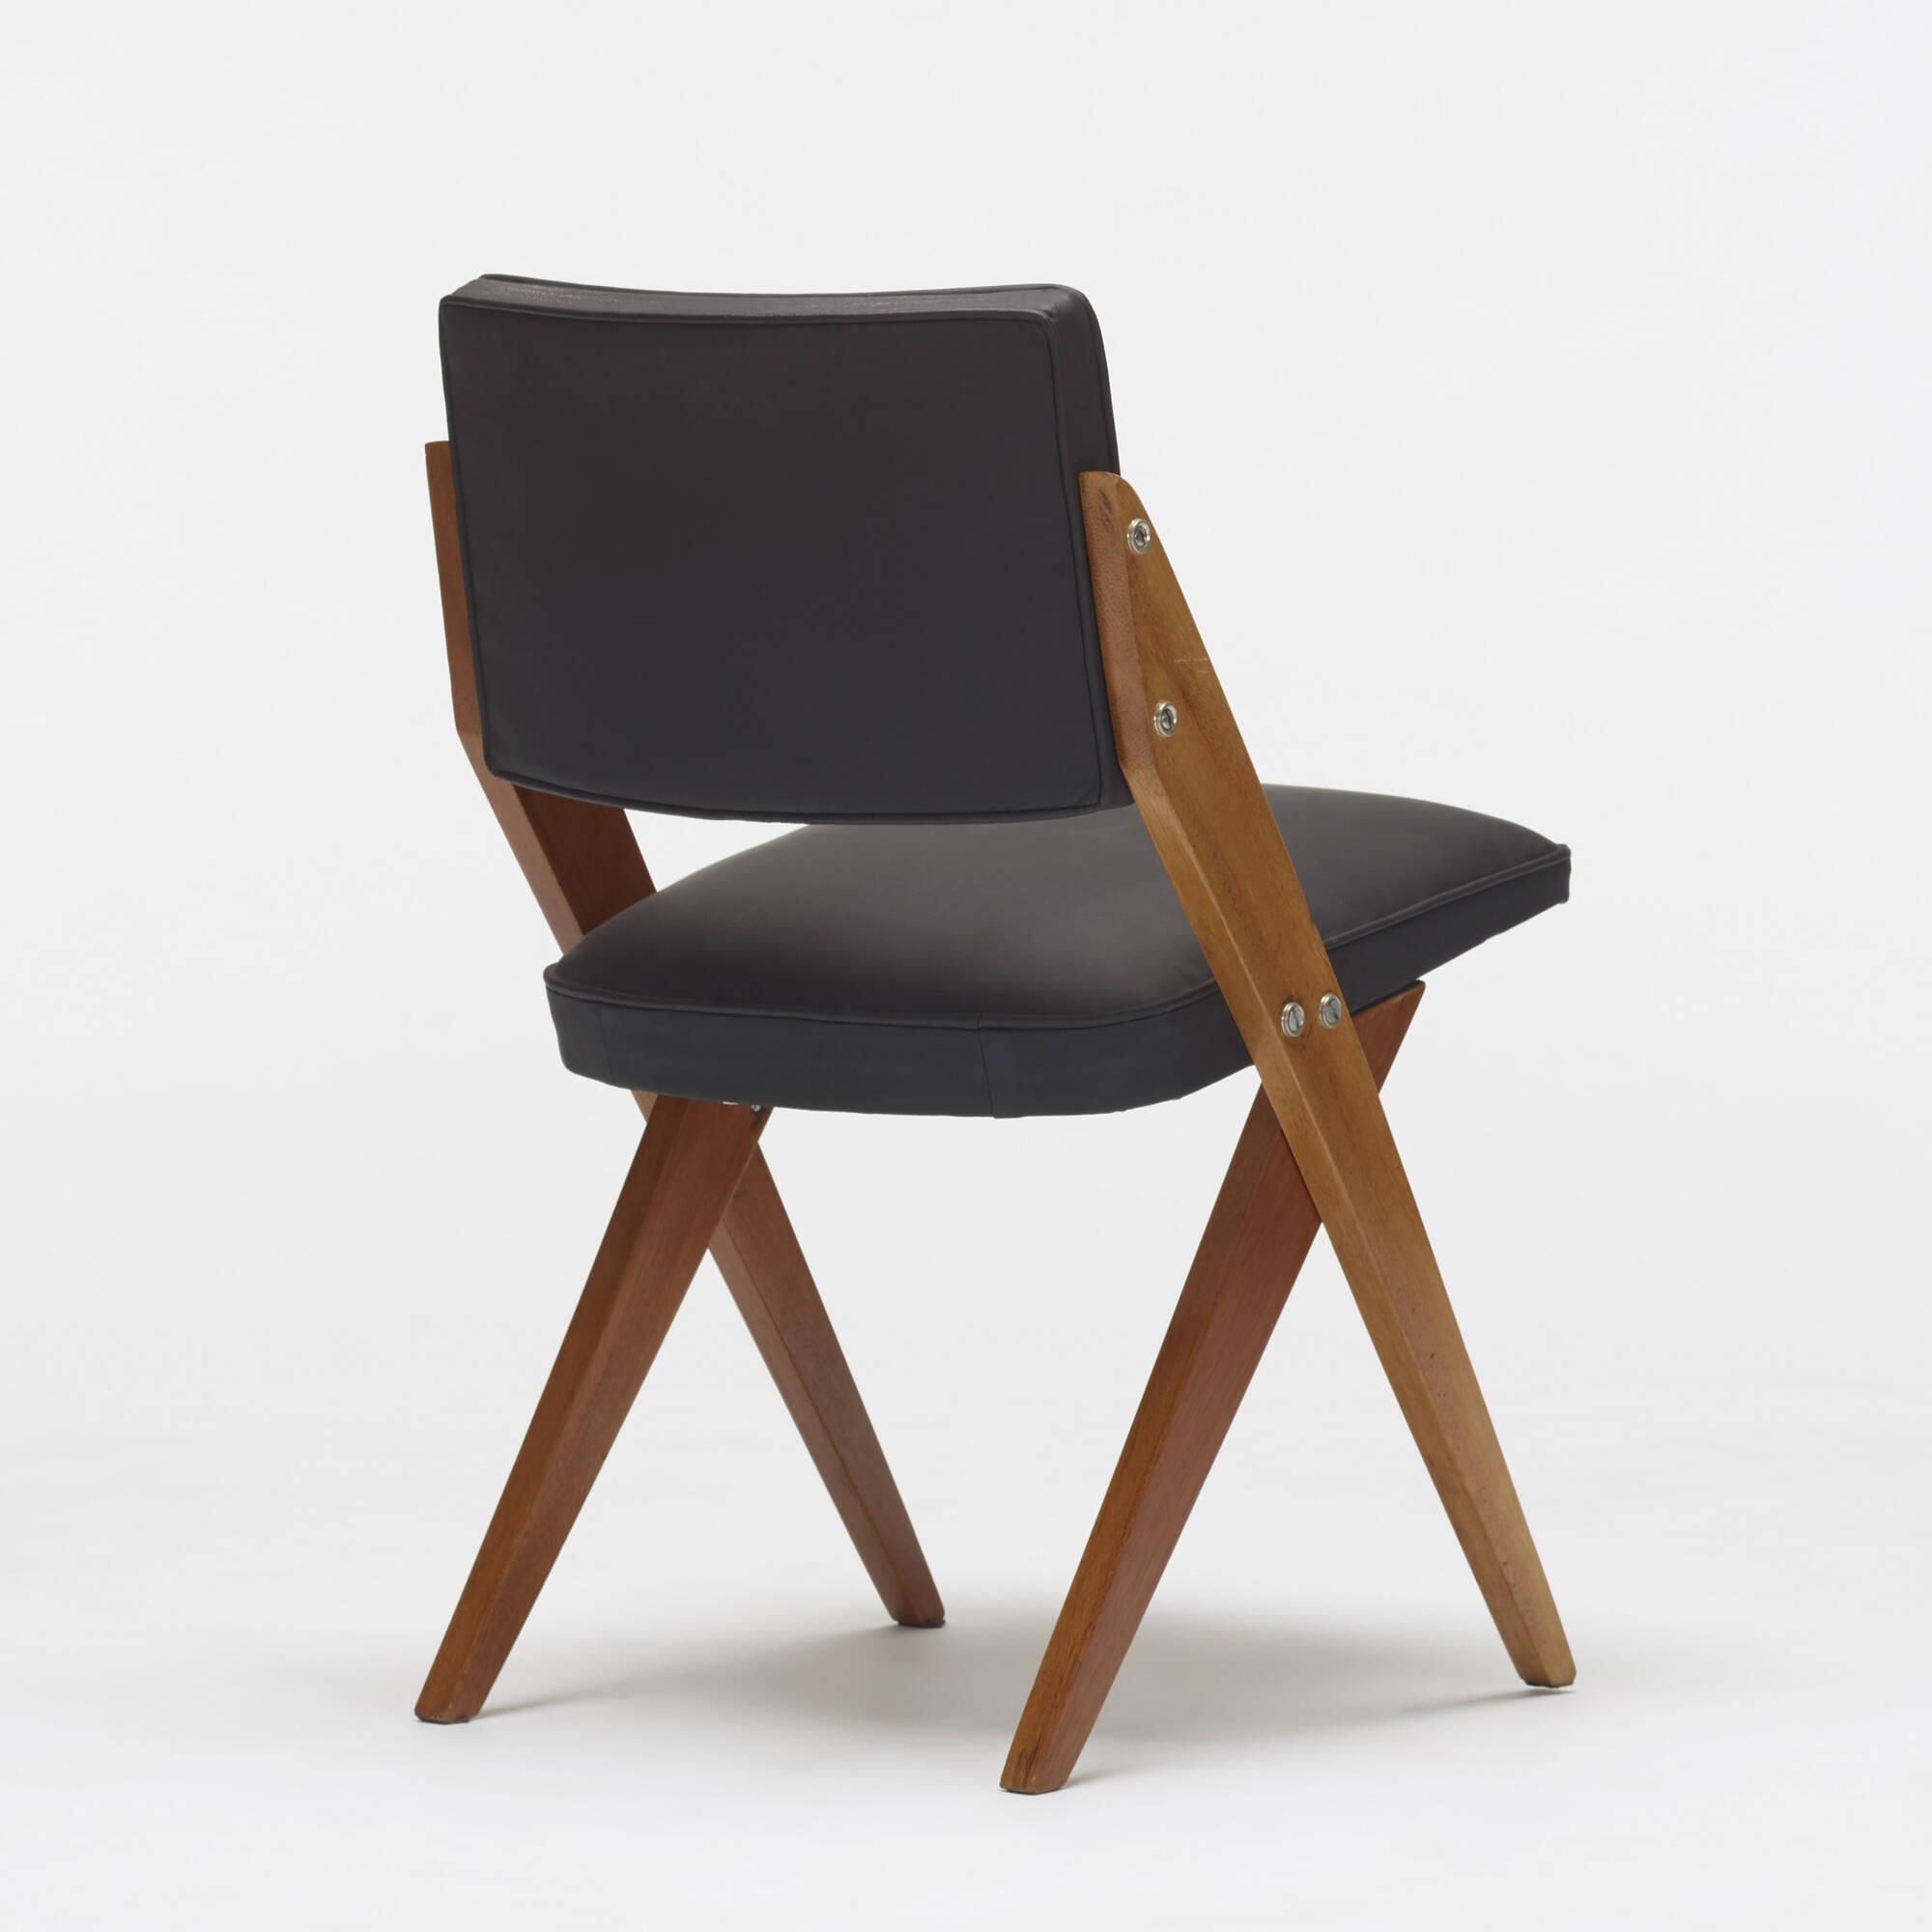 170: José Zanine Caldas / chair (2 of 2)